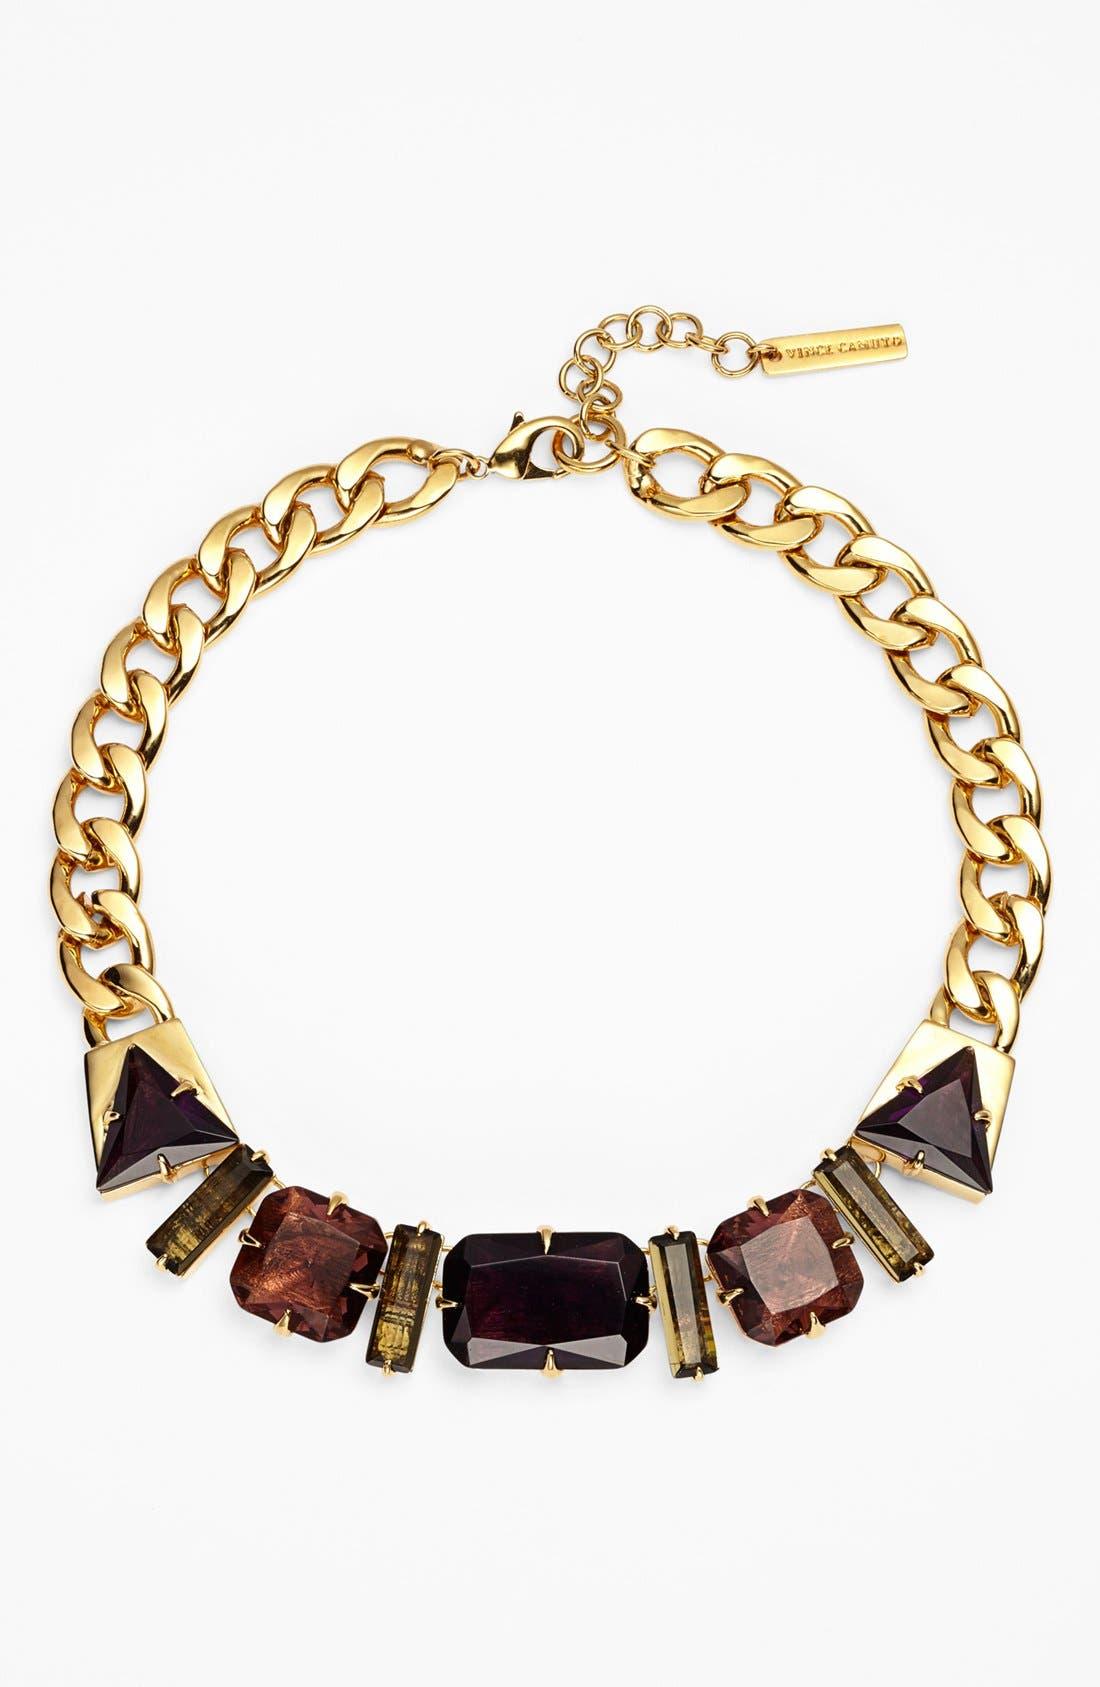 Main Image - Vince Camuto 'Jewel Purpose' Stone Link Collar Necklace